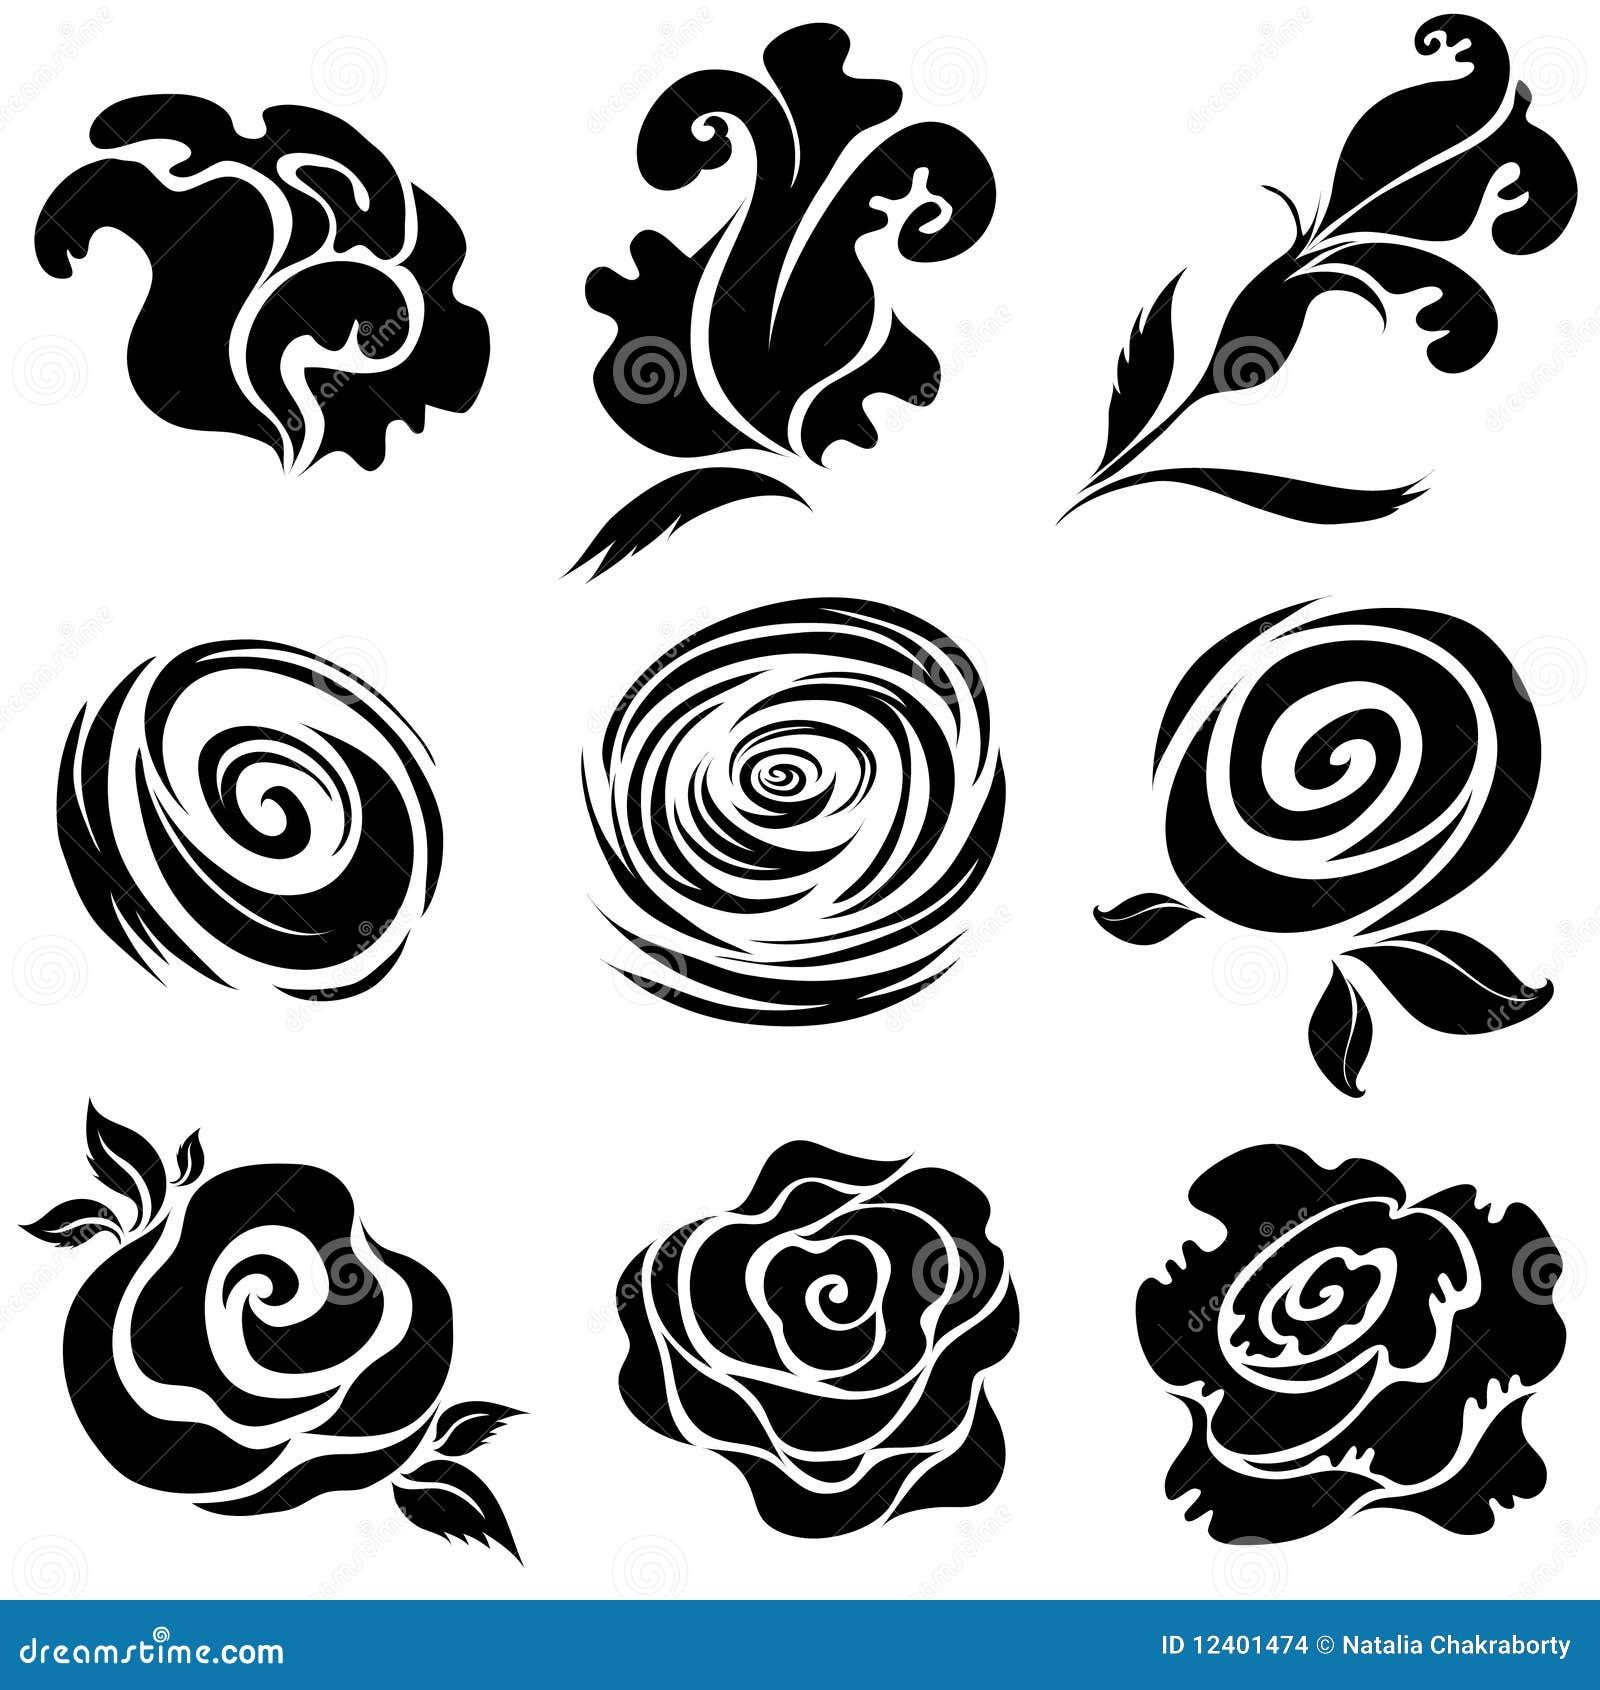 Set Of Black Flower Design Elements Vector Illustration: Set Of Black Rose Flower Design Elements Stock Vector